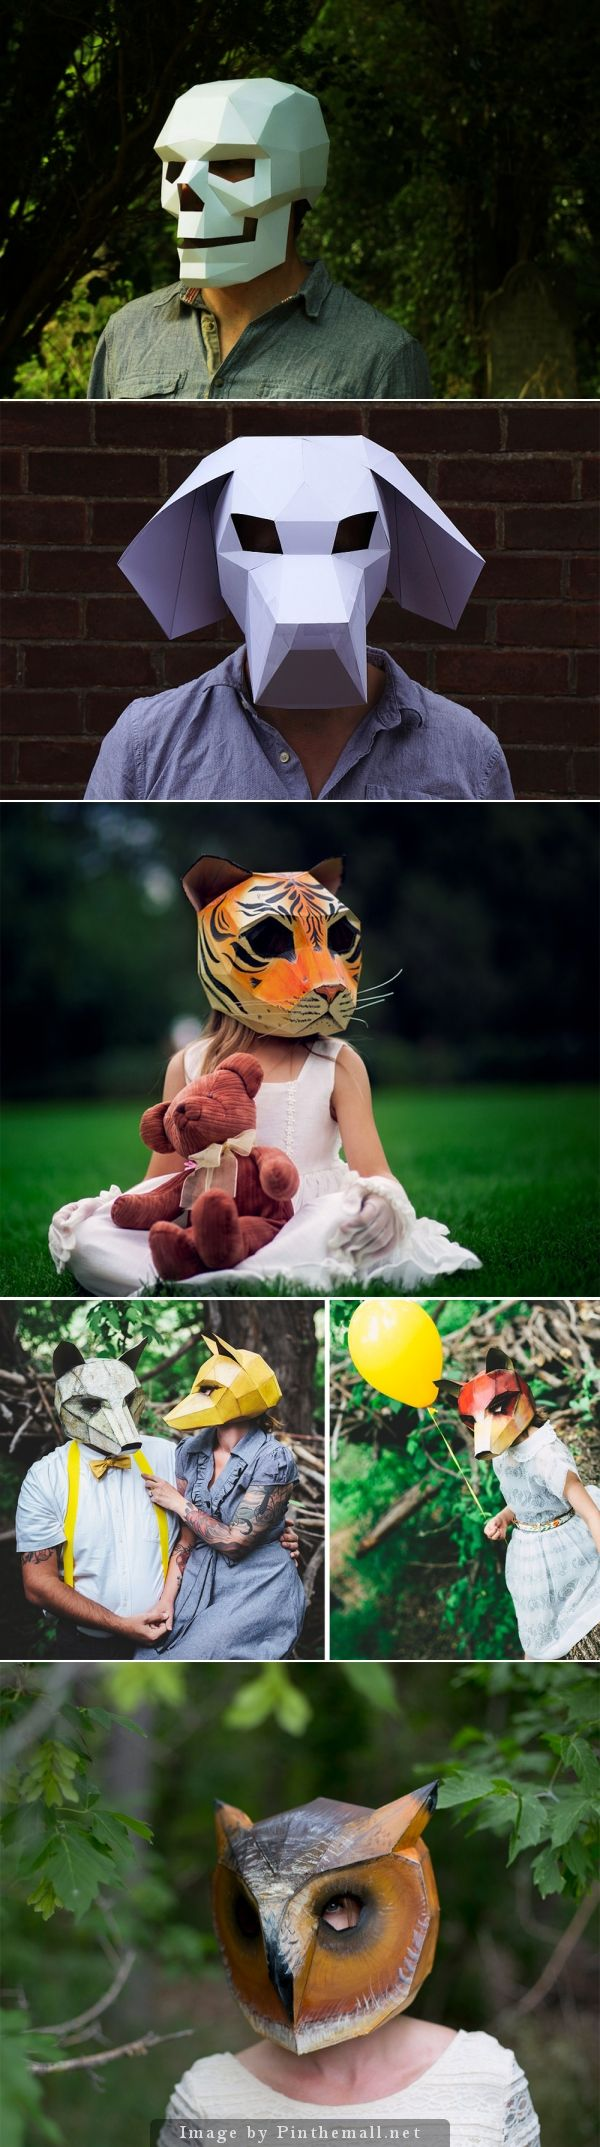 DIY Geometric Paper Masks by Steve Wintercroft by Steve Wintercroft